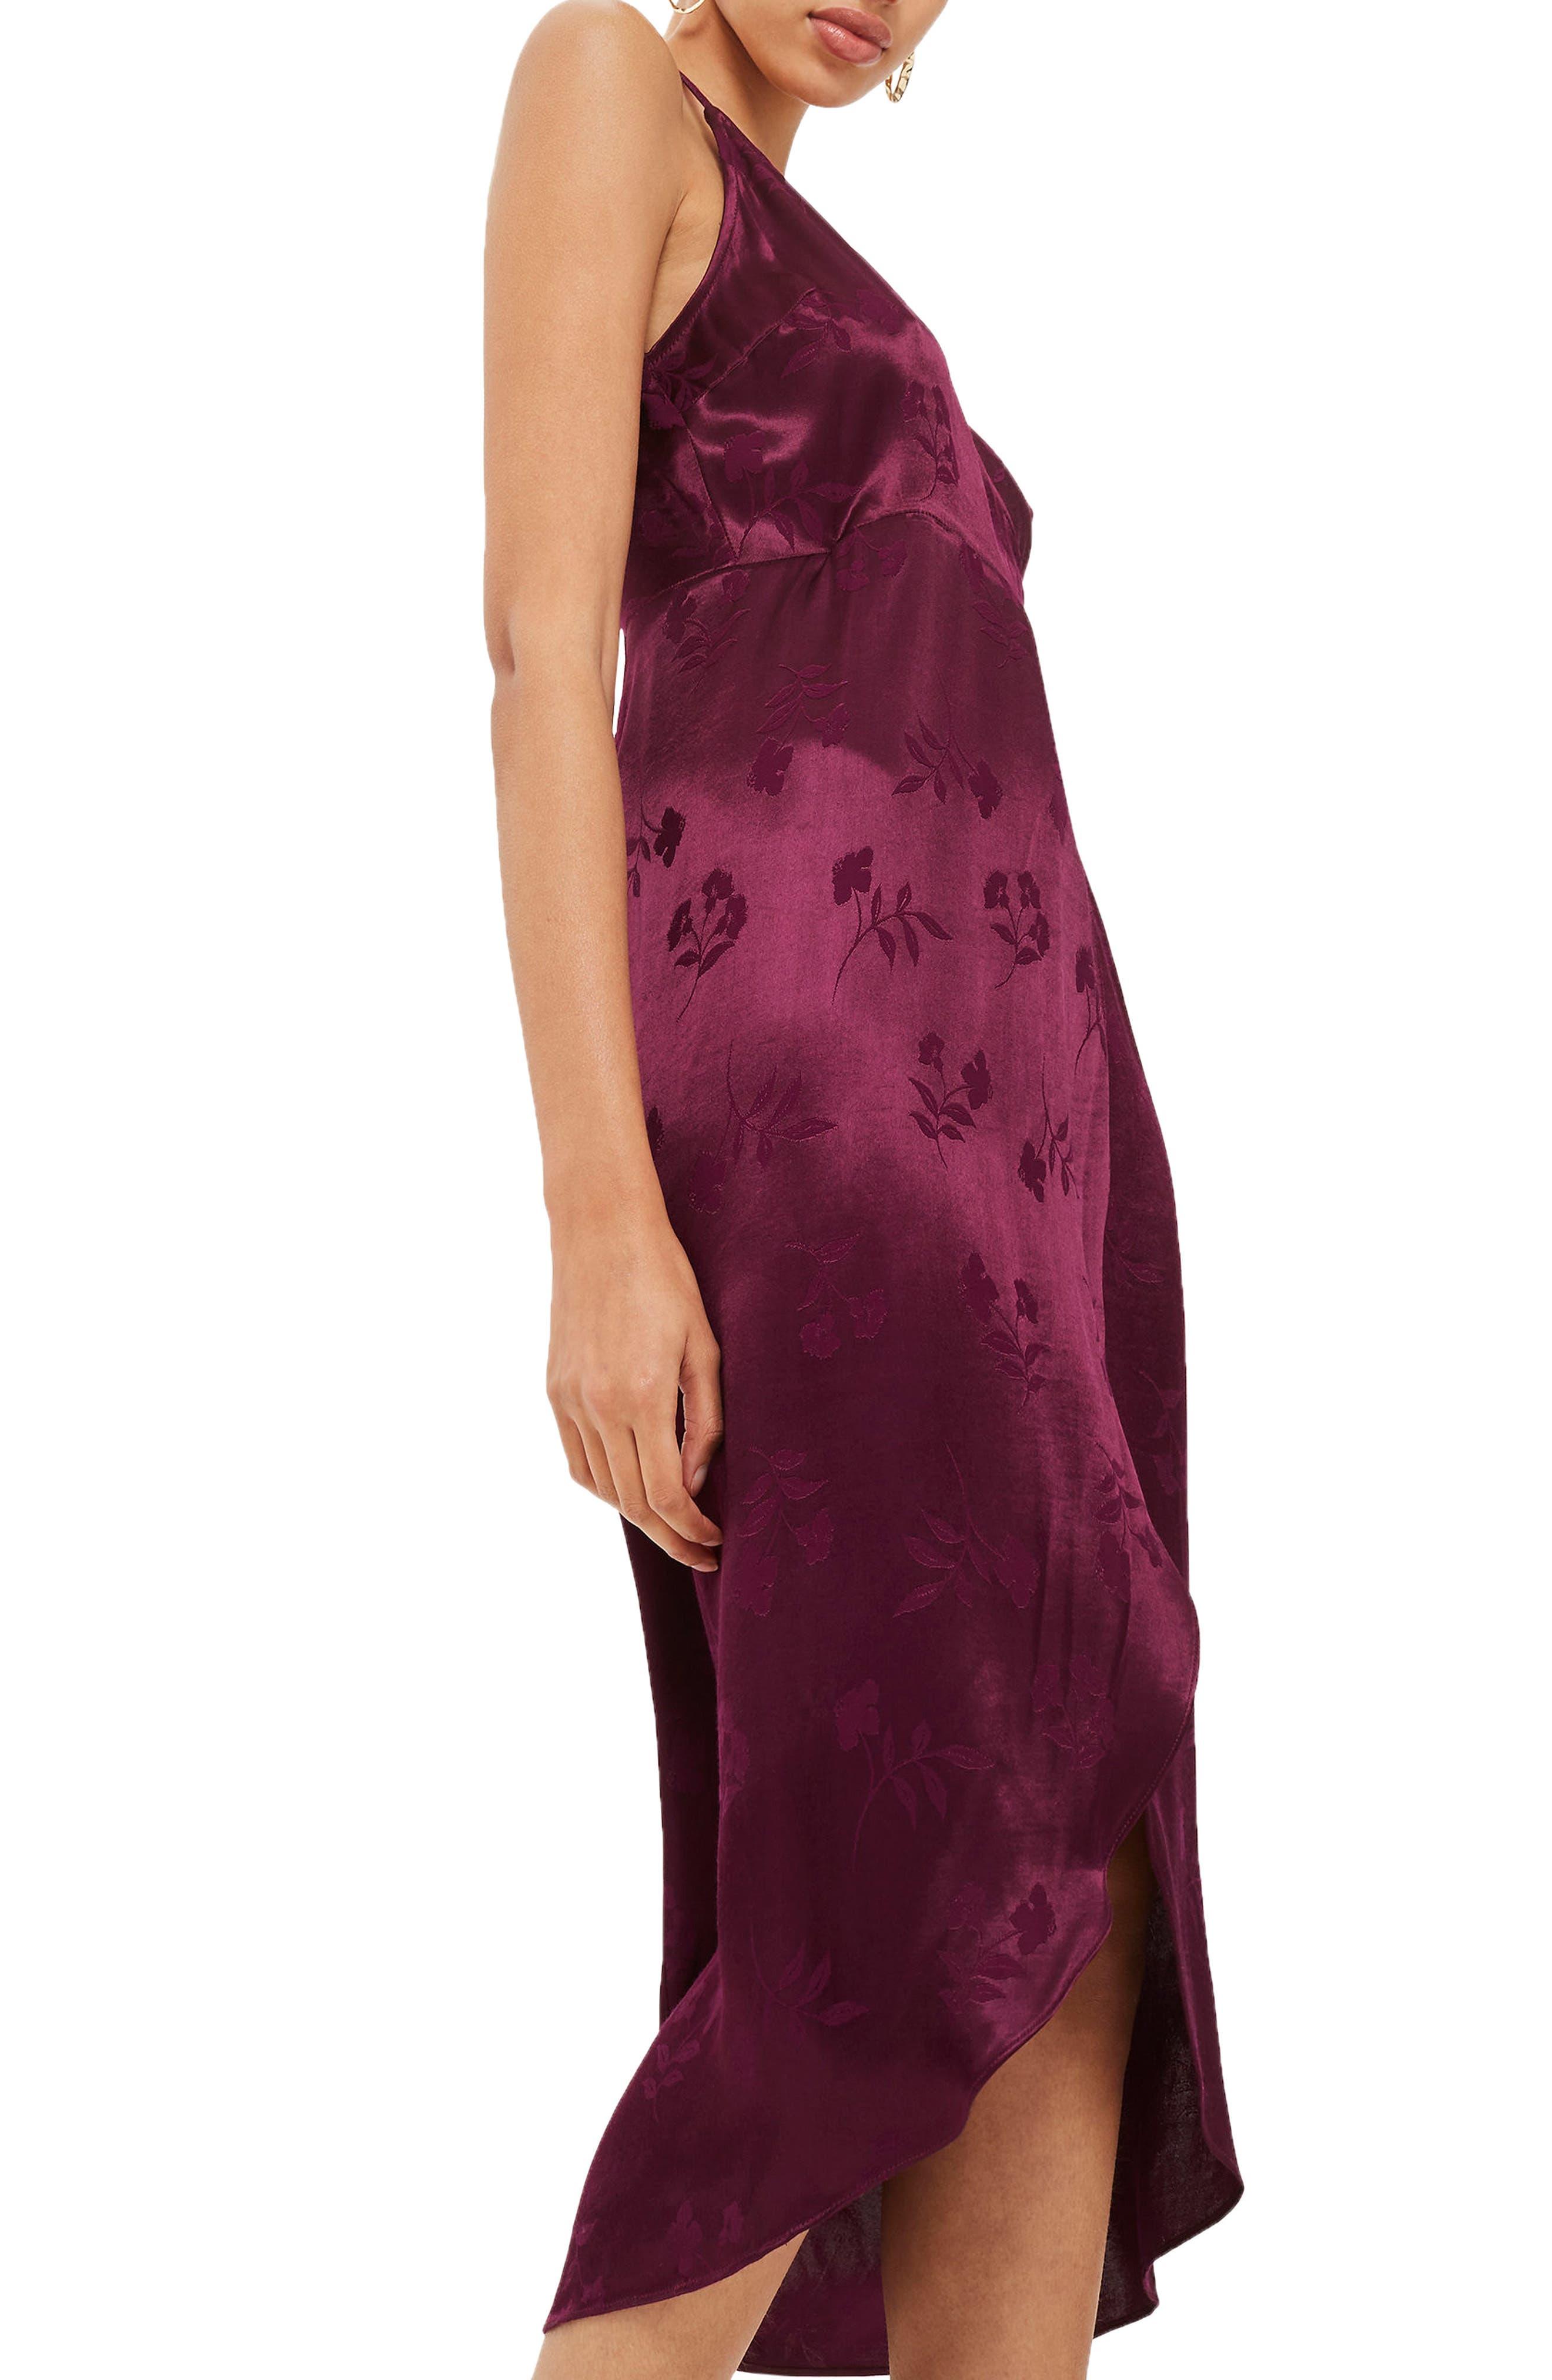 Jacquard Plunge Neck Wrap Dress,                             Alternate thumbnail 4, color,                             Burgundy